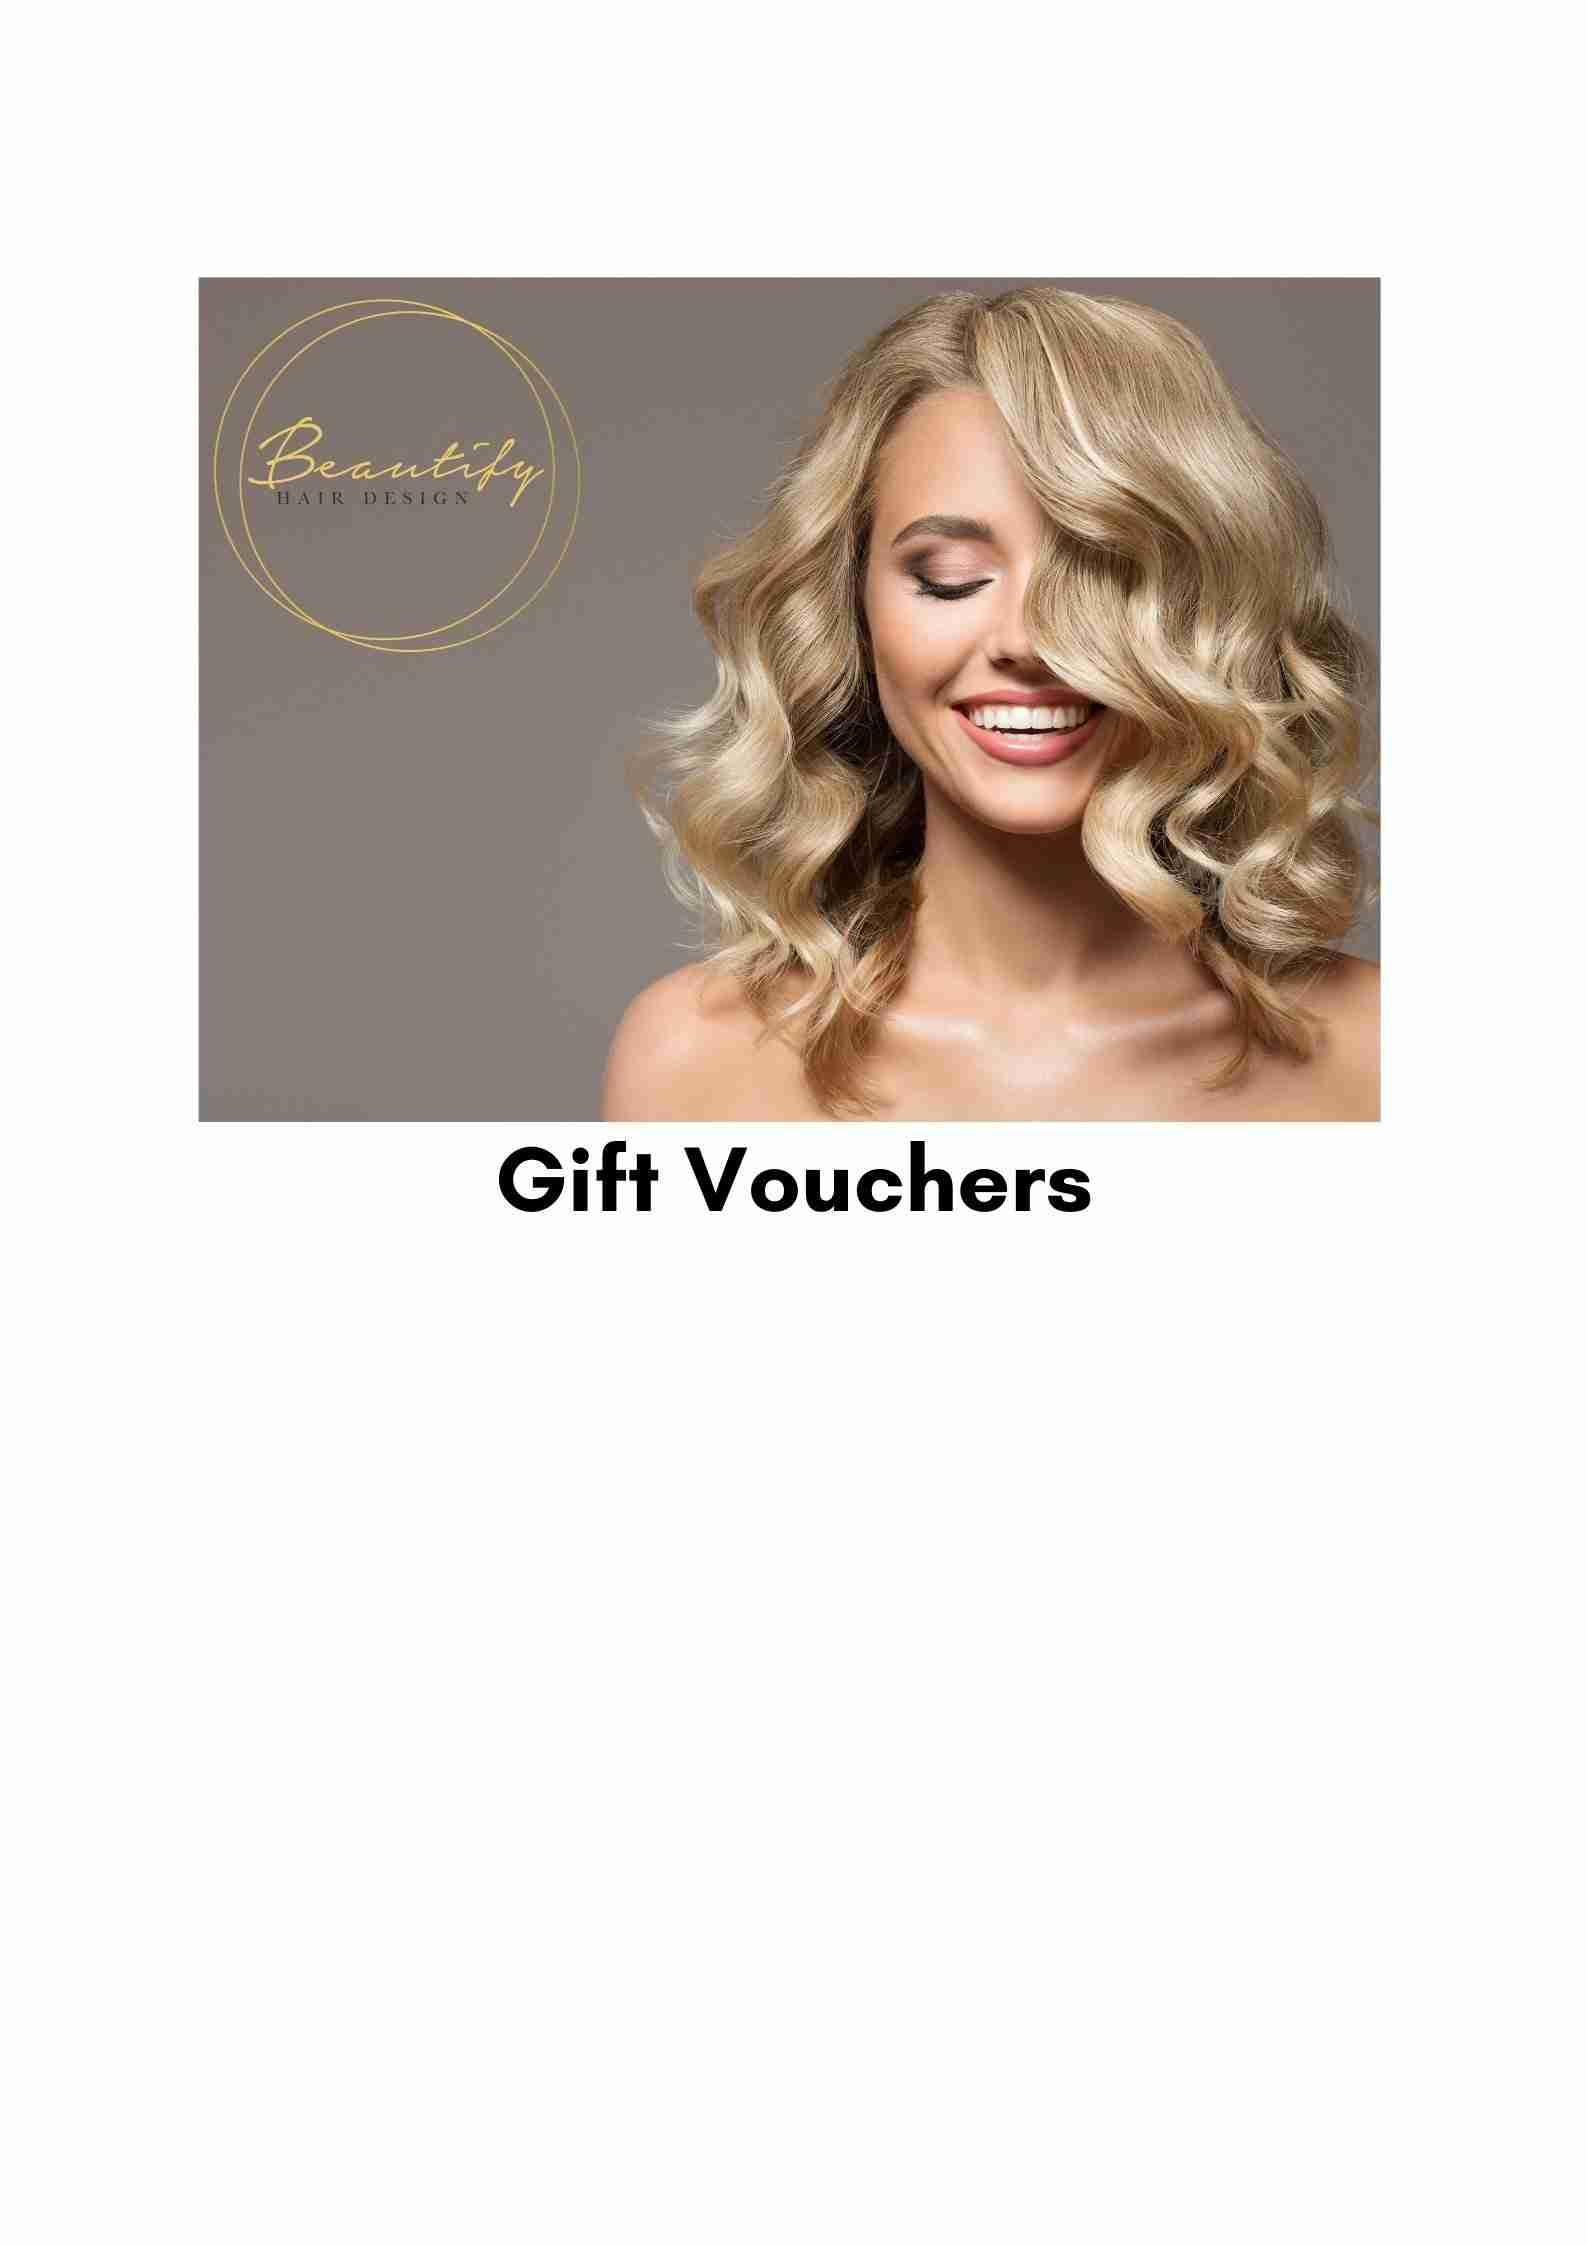 Beautify Gift Vouchers